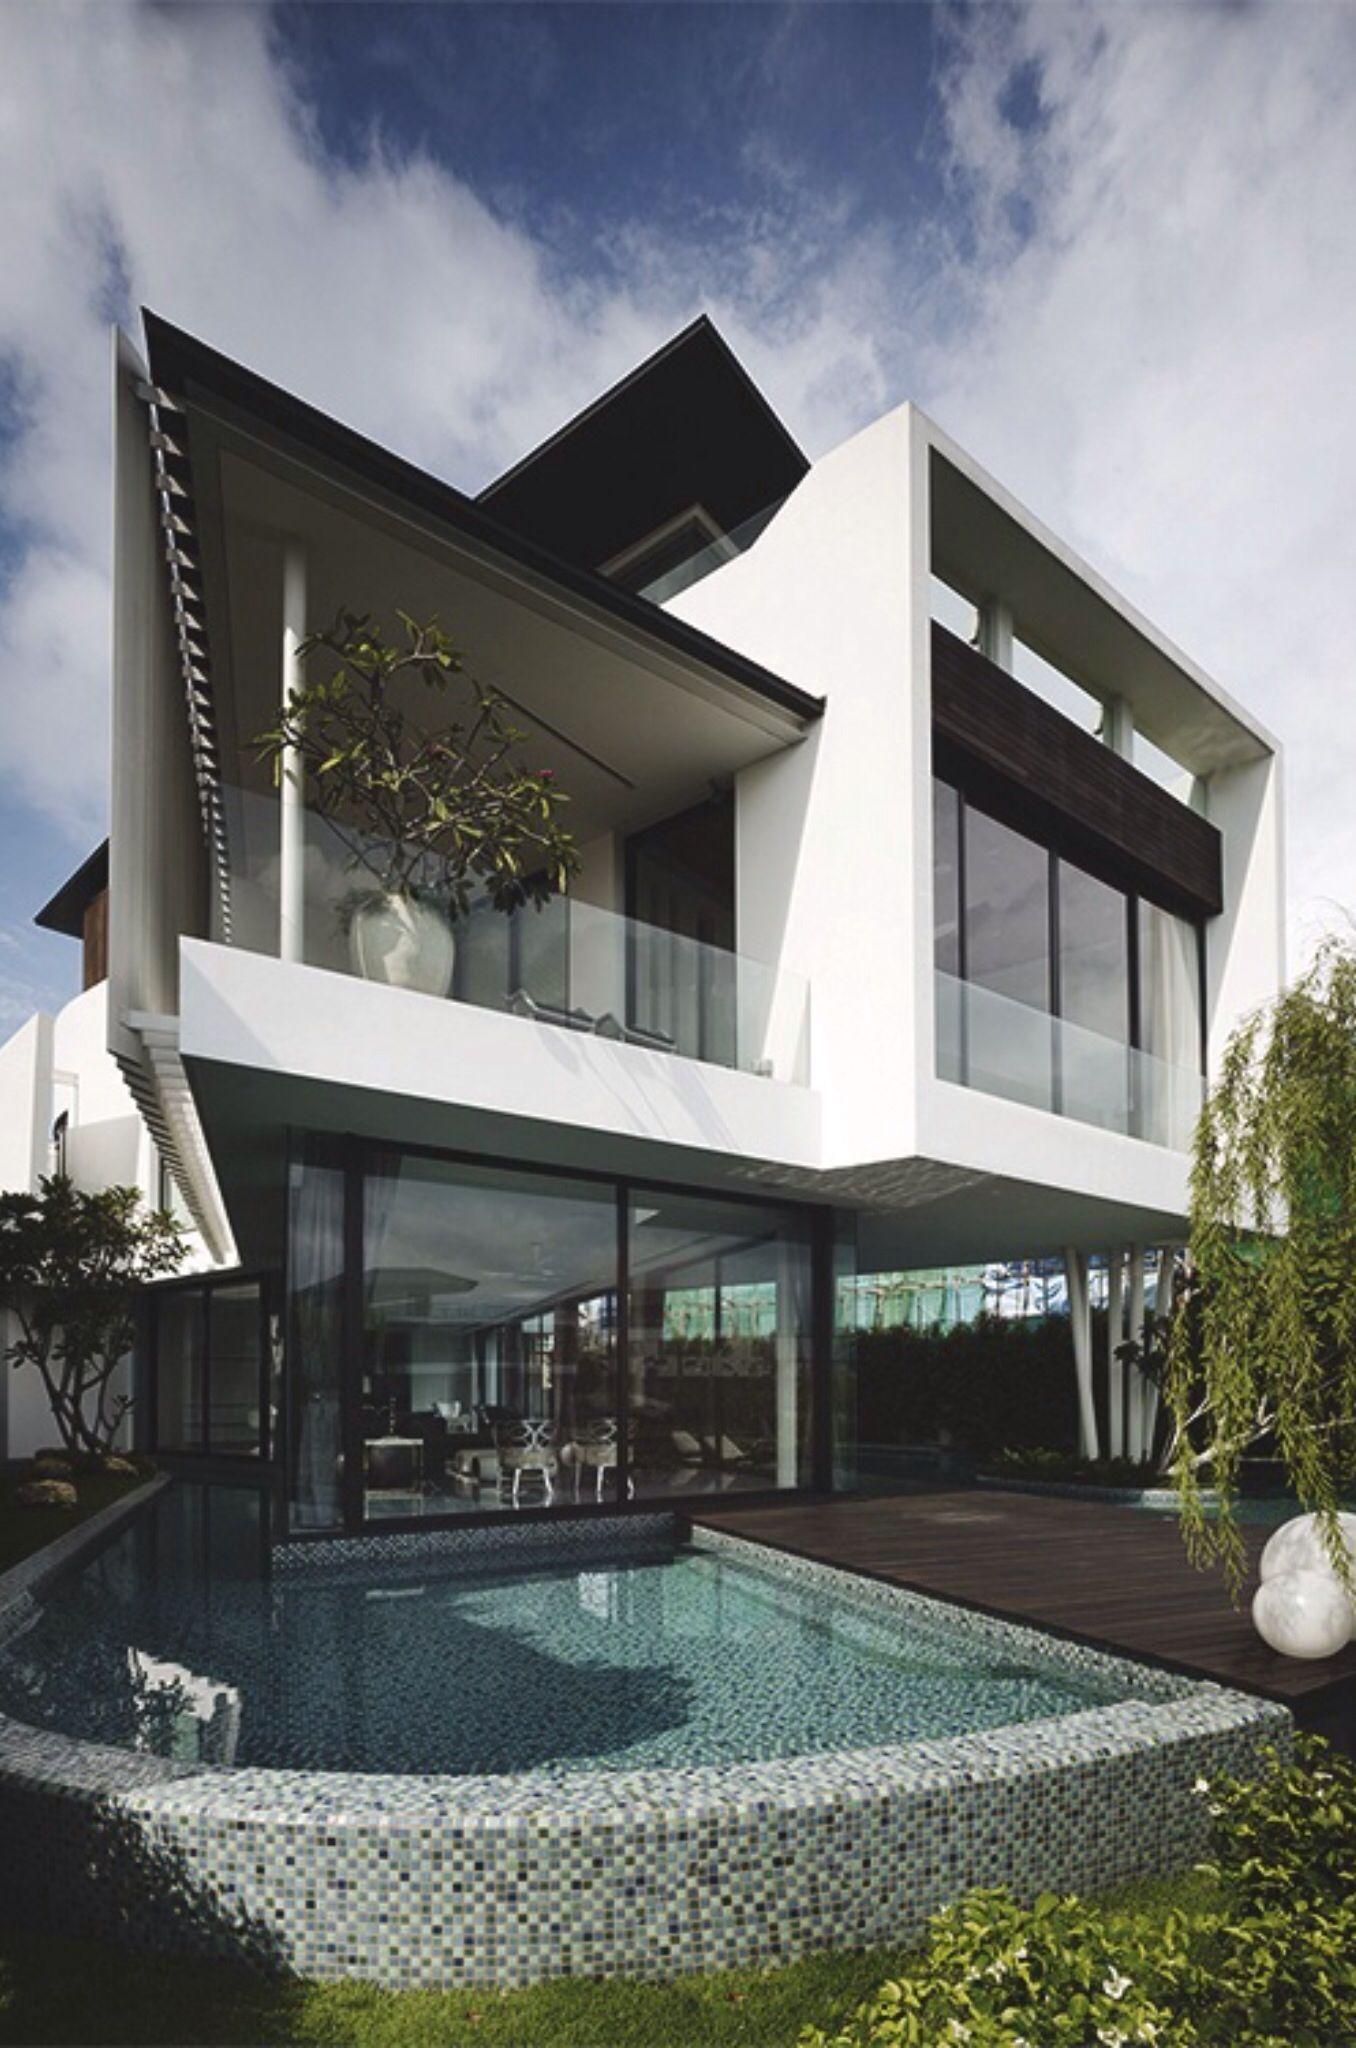 Side view claudio kamargo pinterest architecture luxury pools